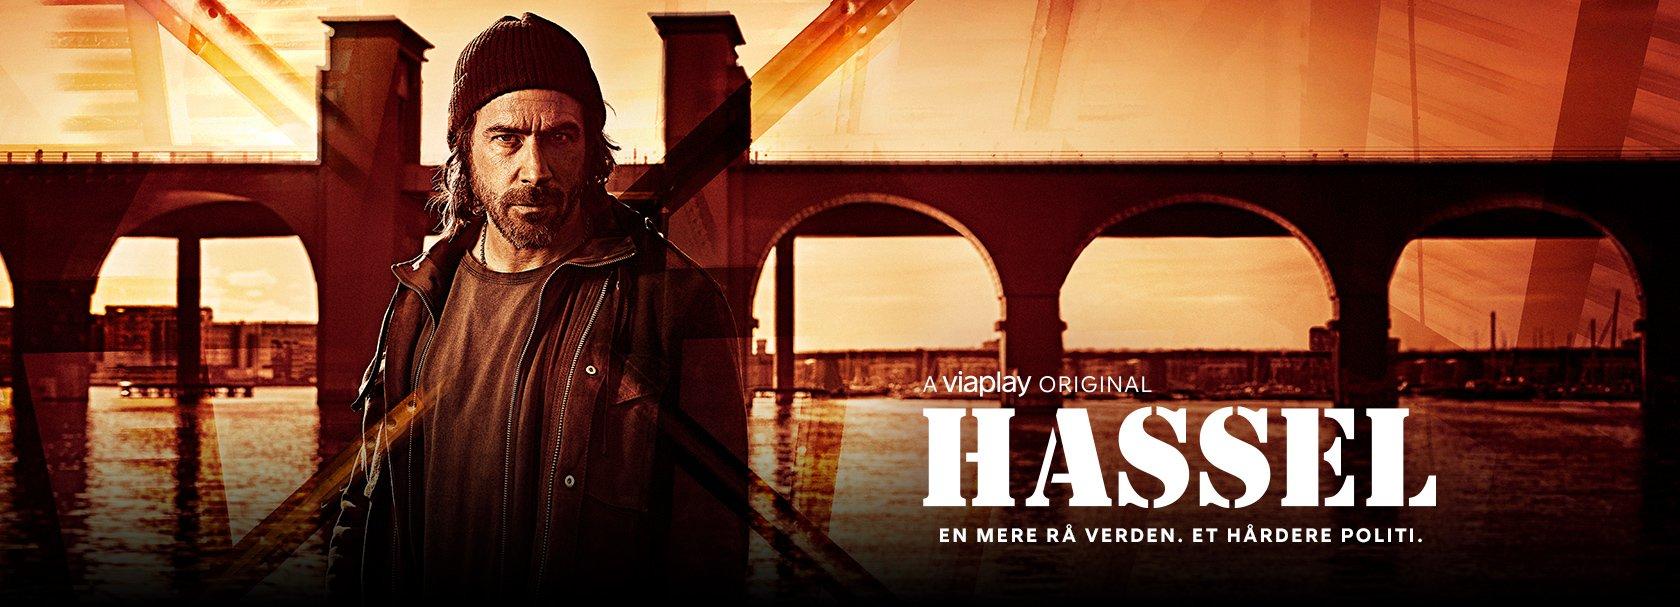 viaplay hassel